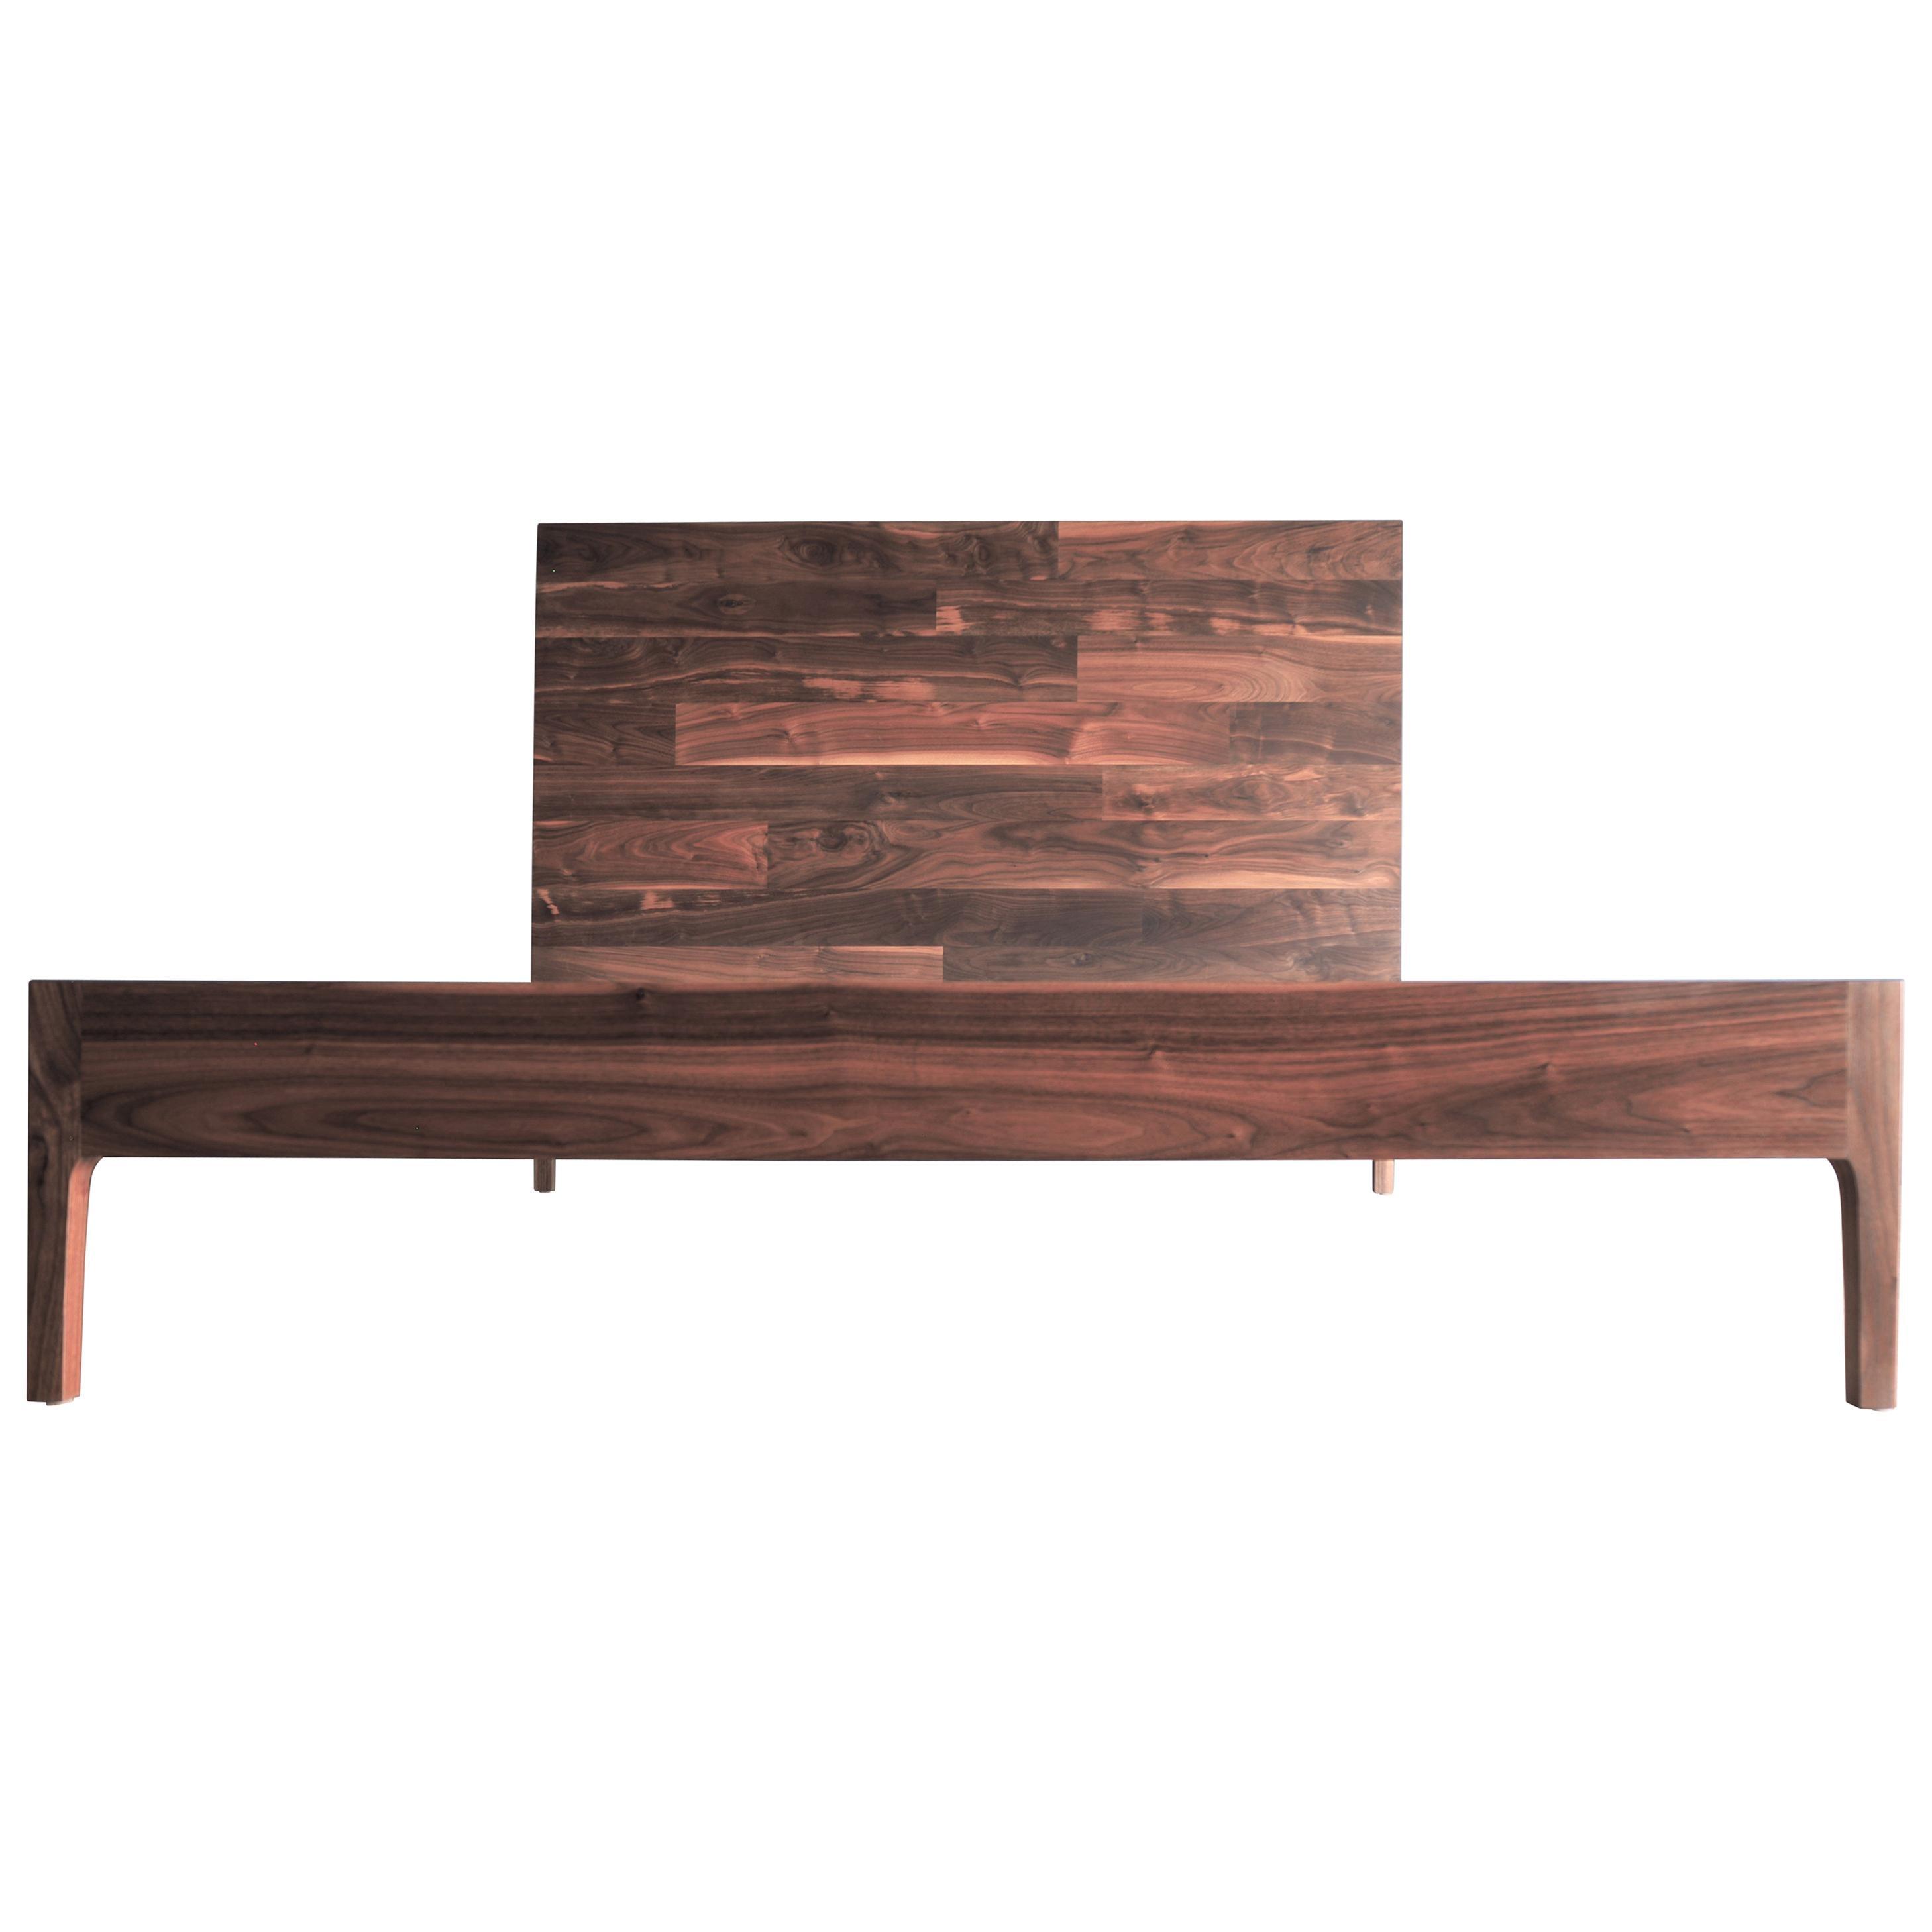 Walnut High Back Bed by MSJ Furniture Studio